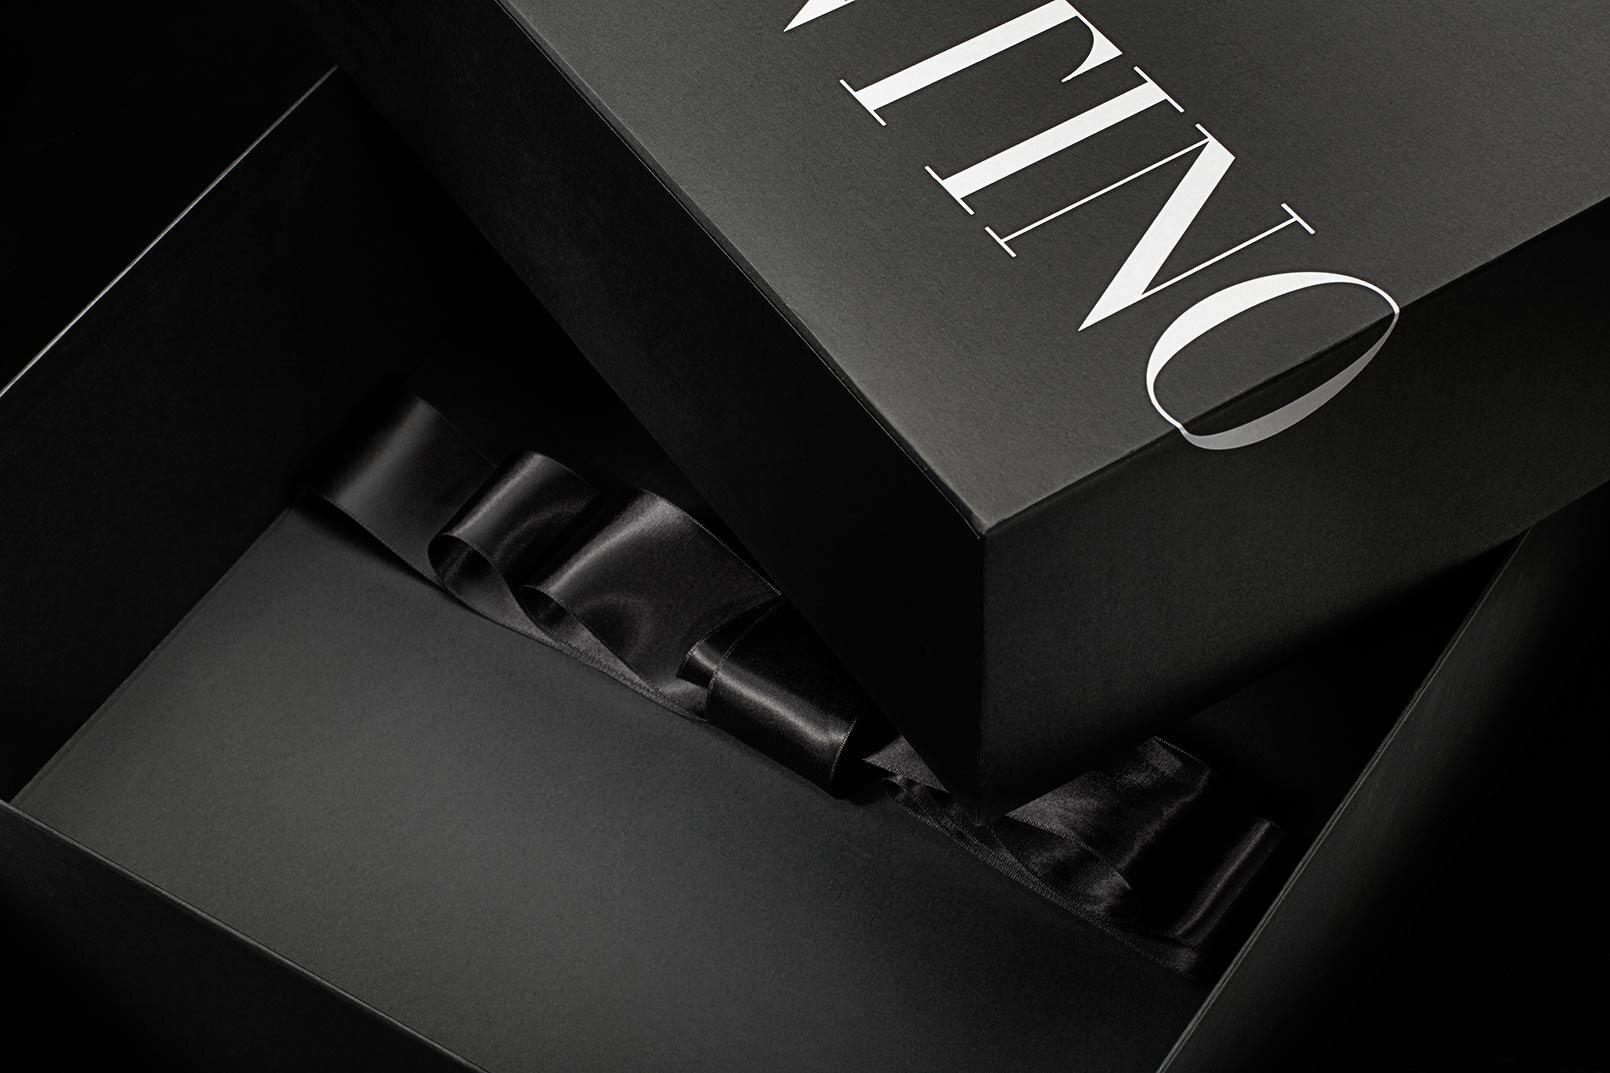 Valentino-Box-Design-Packaging-Company-2.JPG